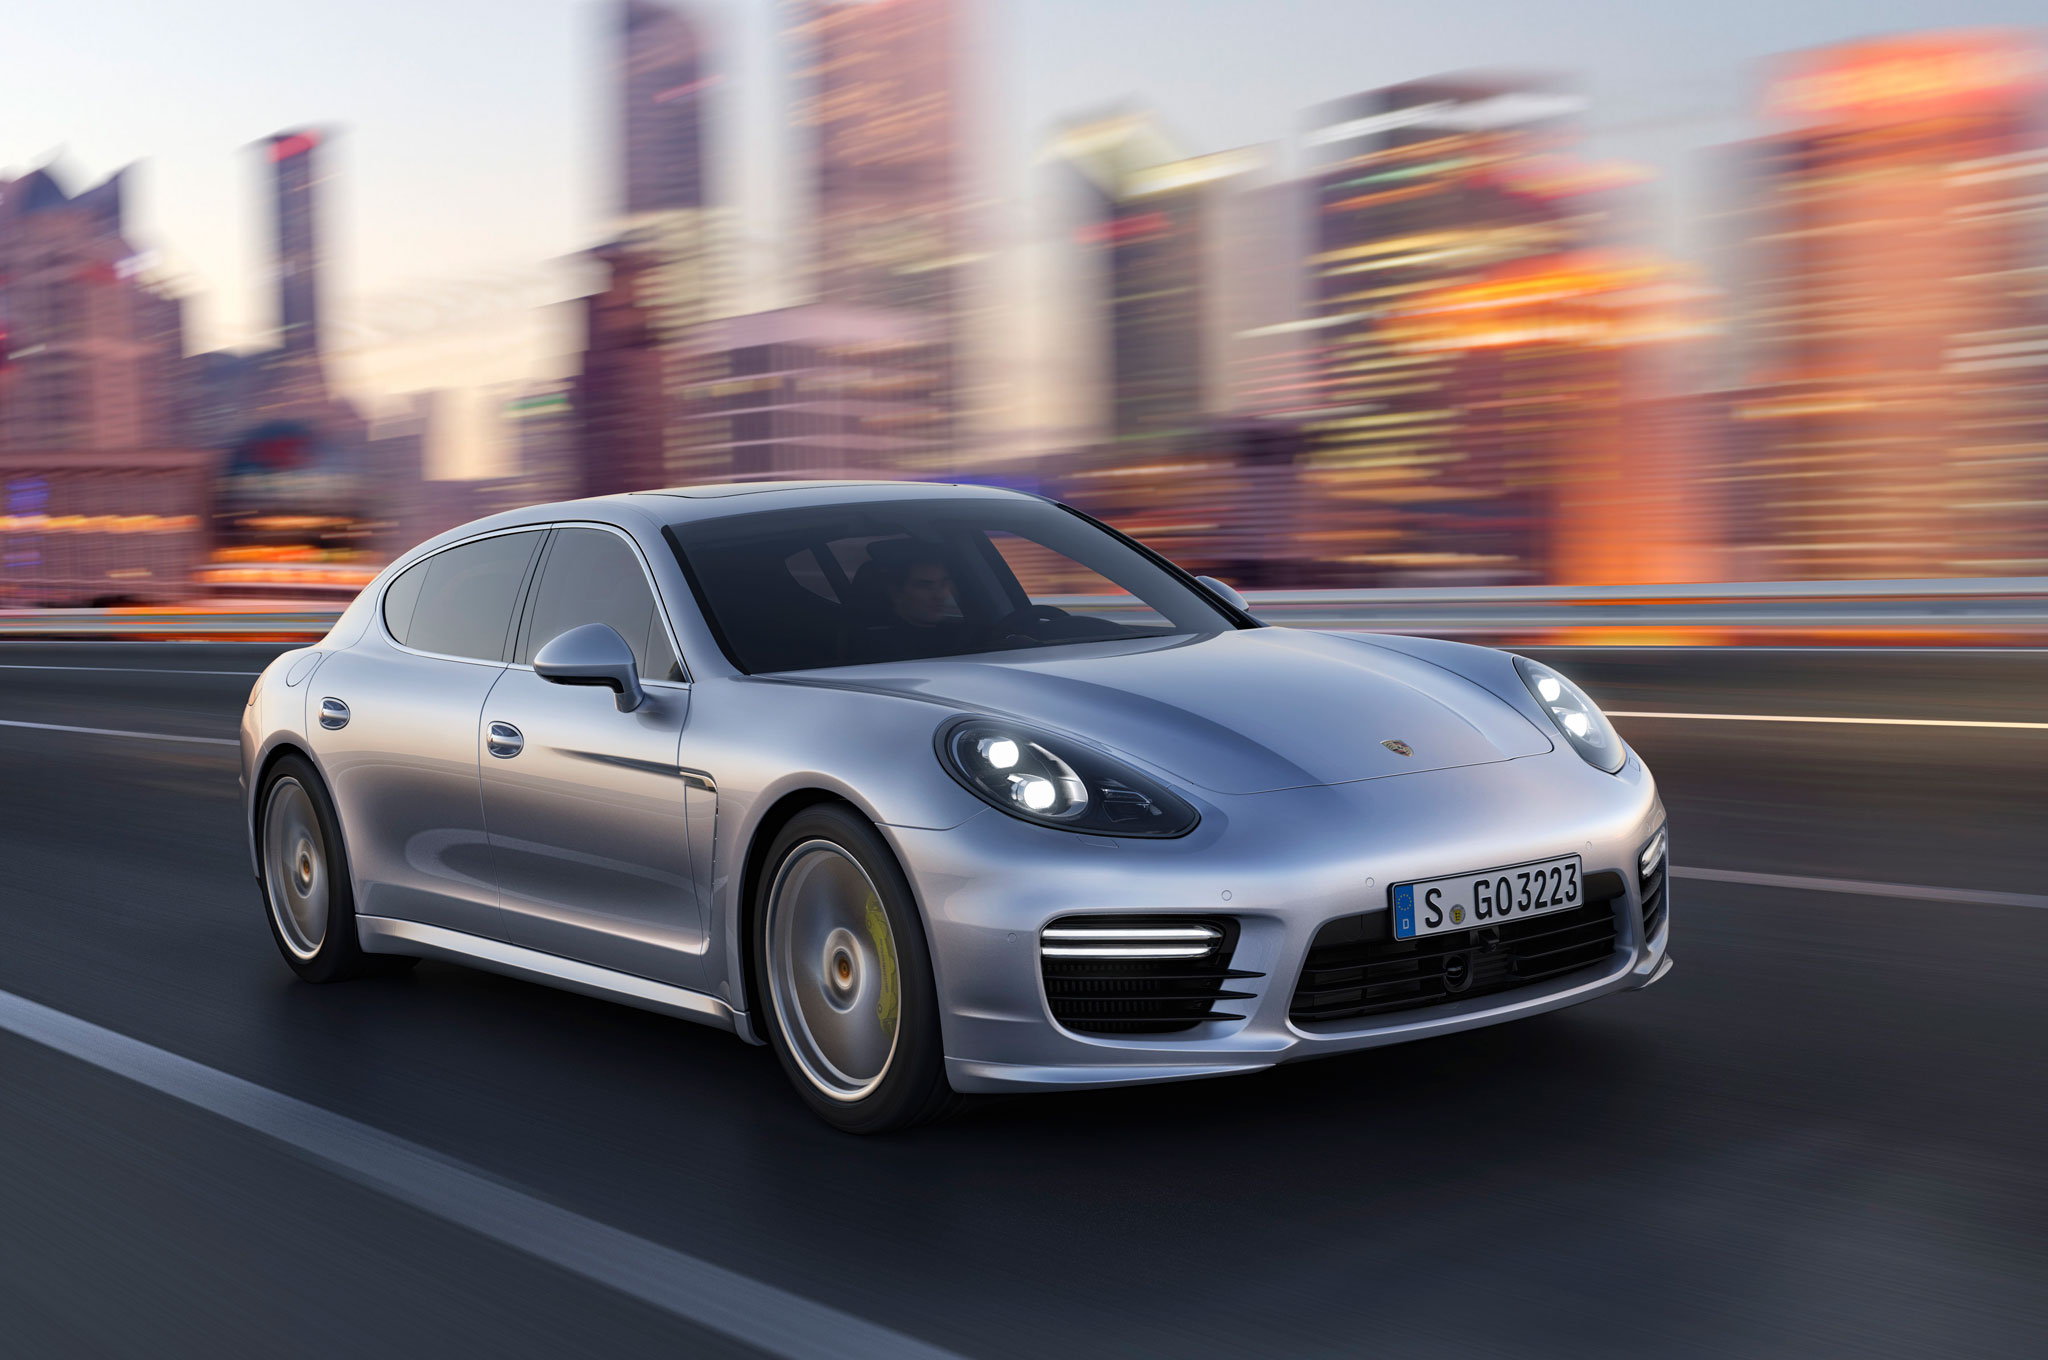 2014 porsche panamera interior car tuning - Continual Improvement